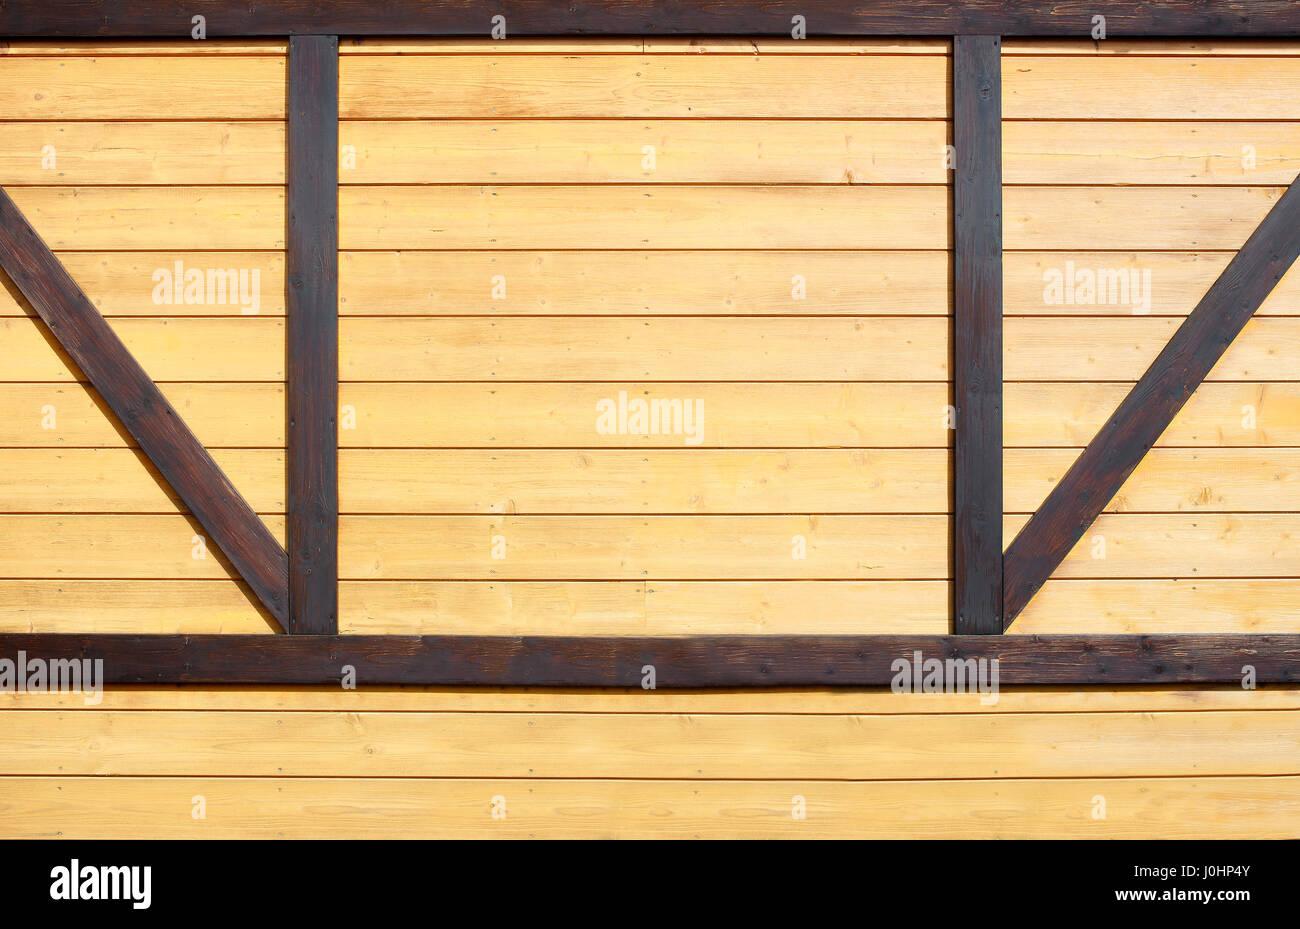 Decorative Board Stock Photos & Decorative Board Stock Images - Alamy